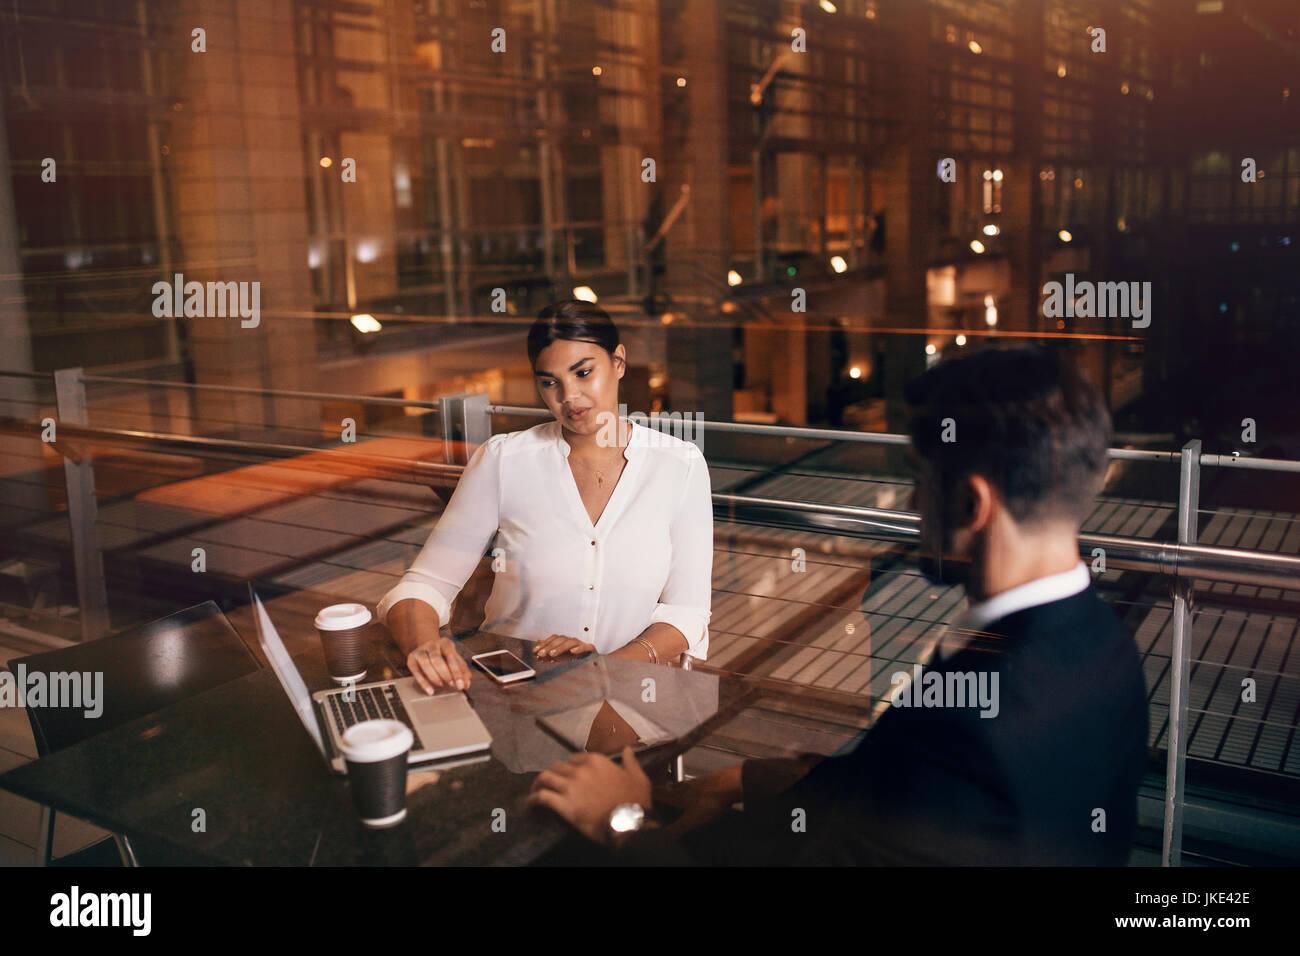 Geschäftsfrau mit Mann diskutieren Geschäft am Café-Tisch sitzen. Business-Leute warten am Flughafen Stockbild